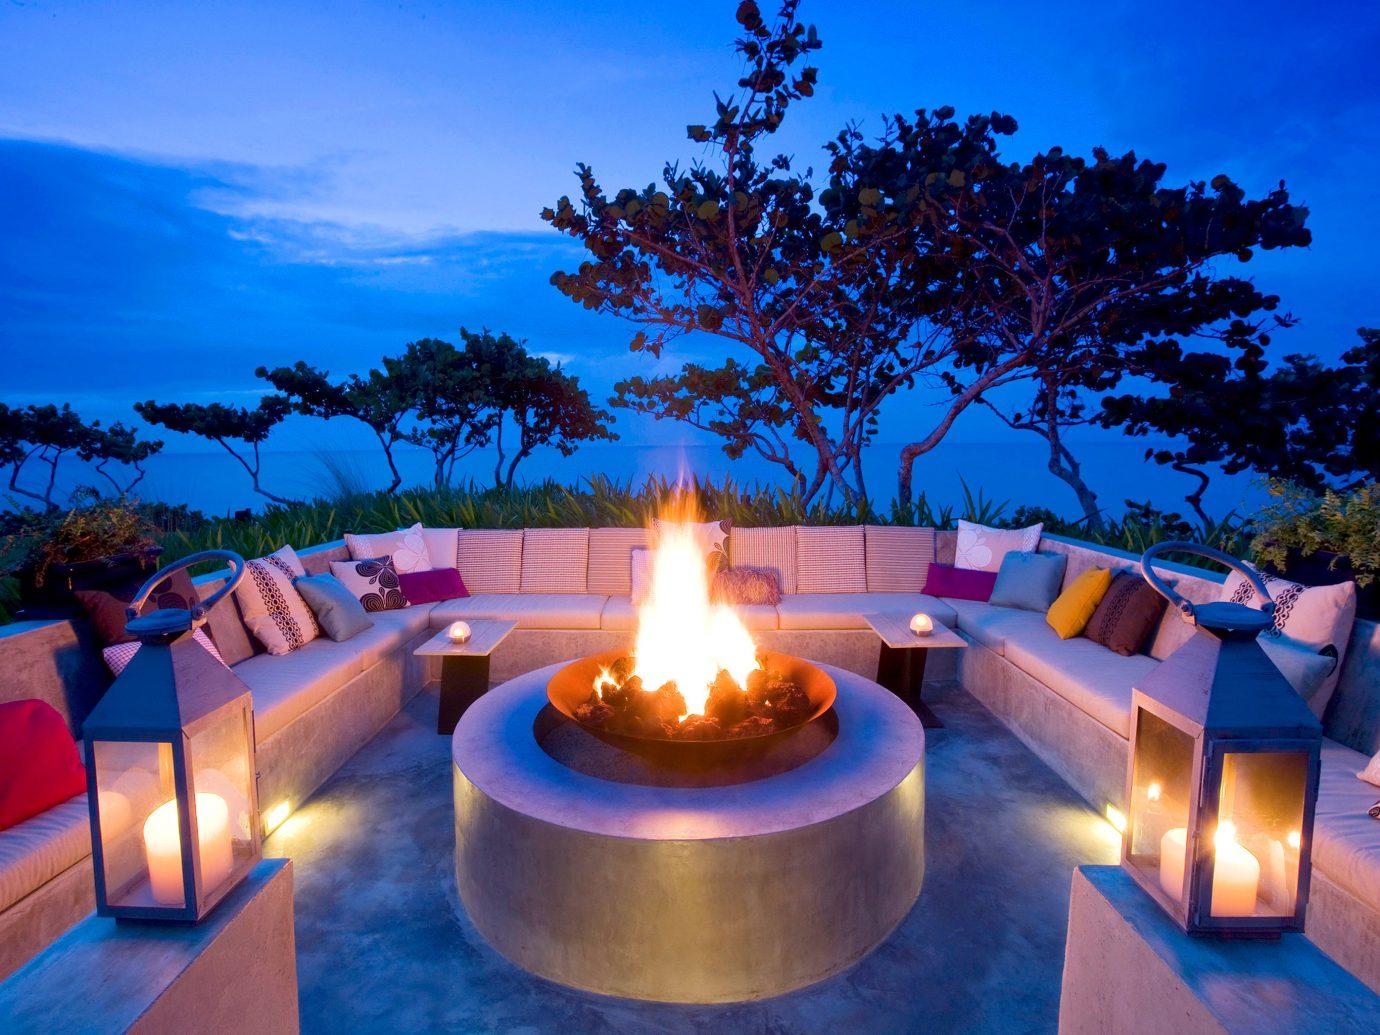 Firepit Lounge Resort tree sky candle leisure swimming pool lit